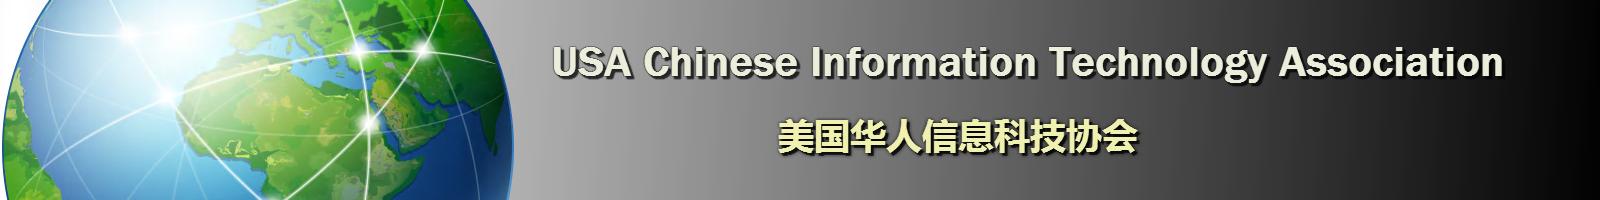 USA Chinese Information Technology Association